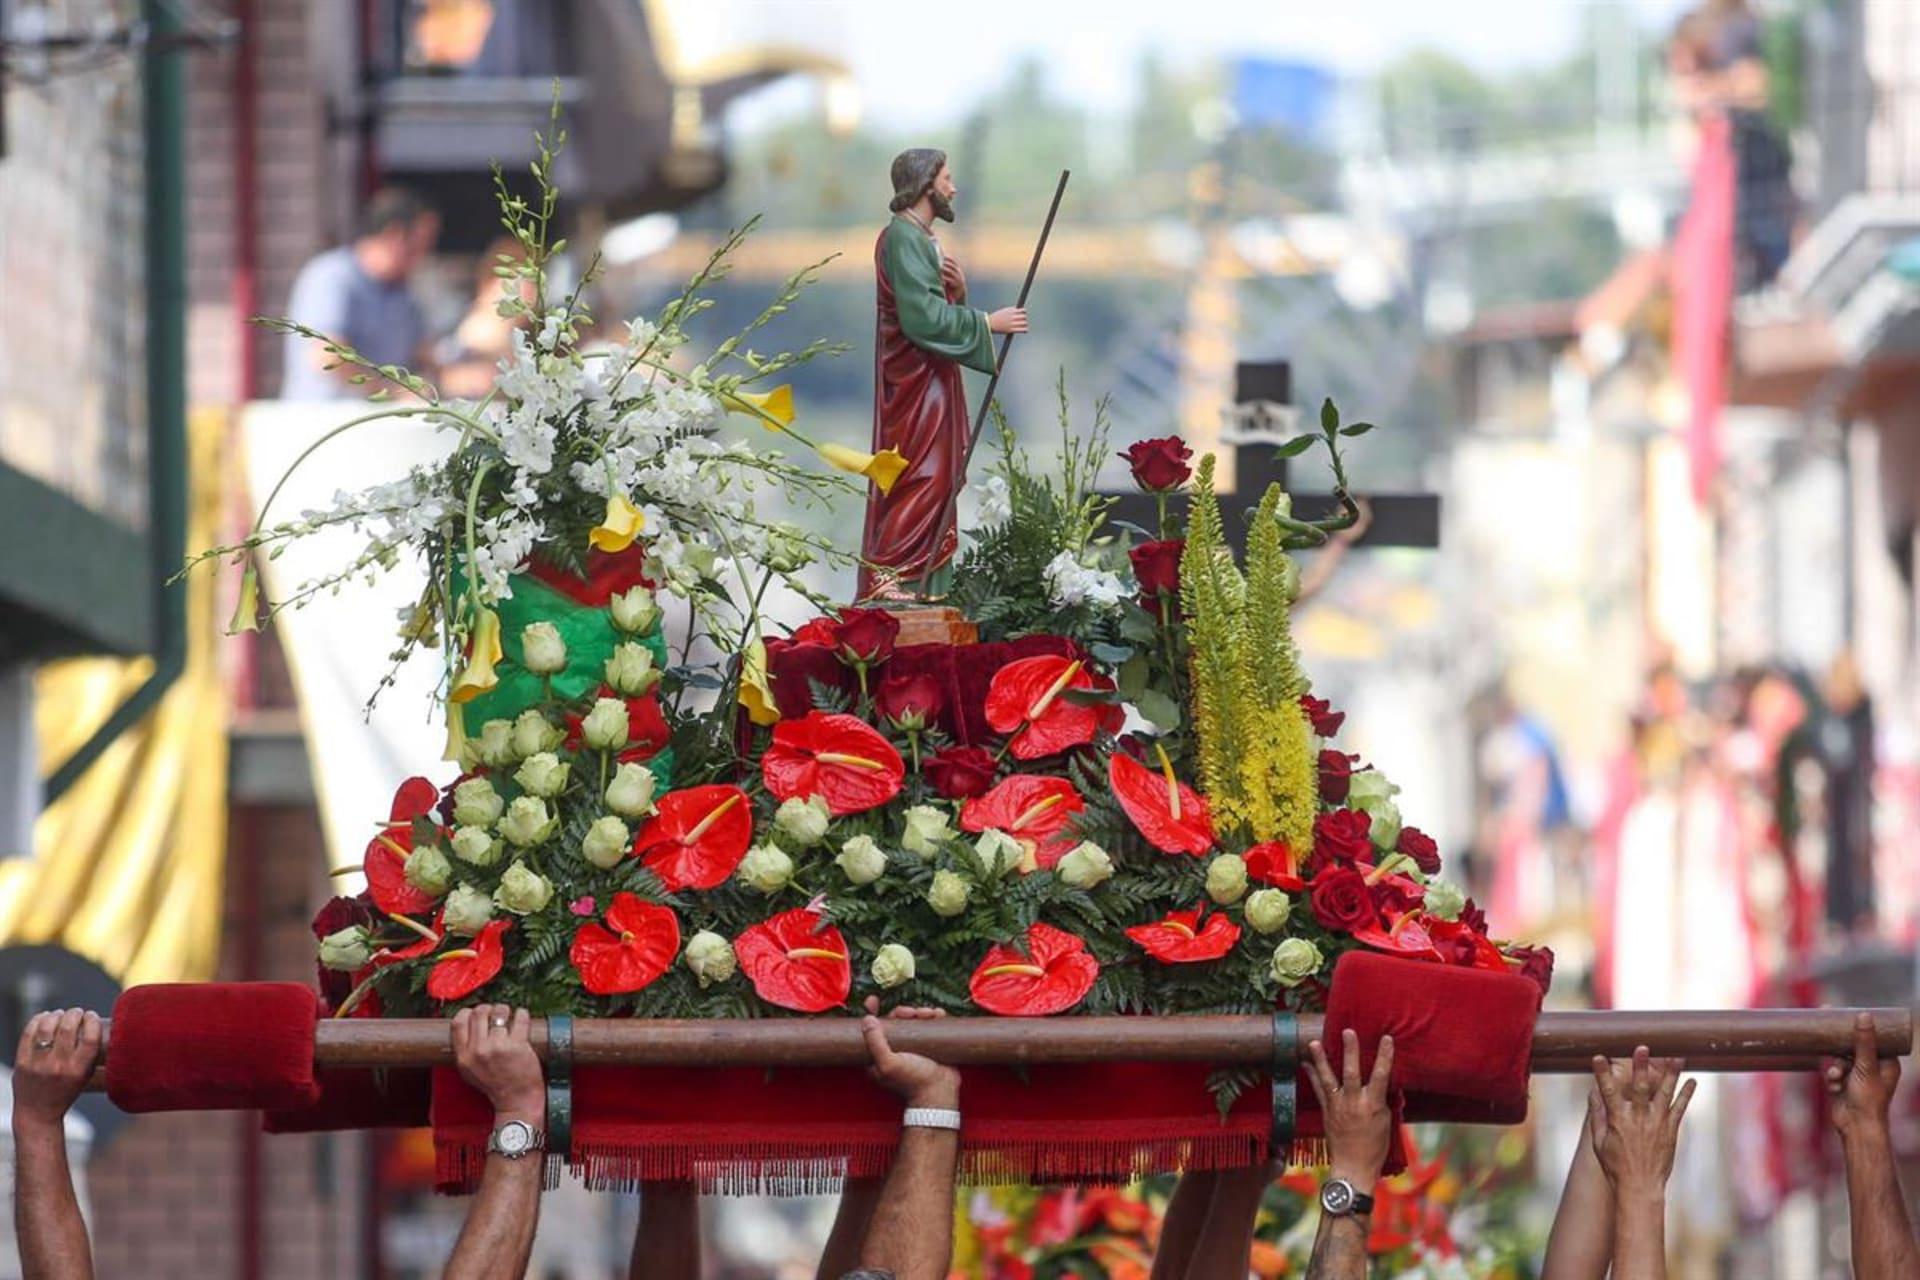 Gaia - Festivities of St. Peter, Patron of Fishermen